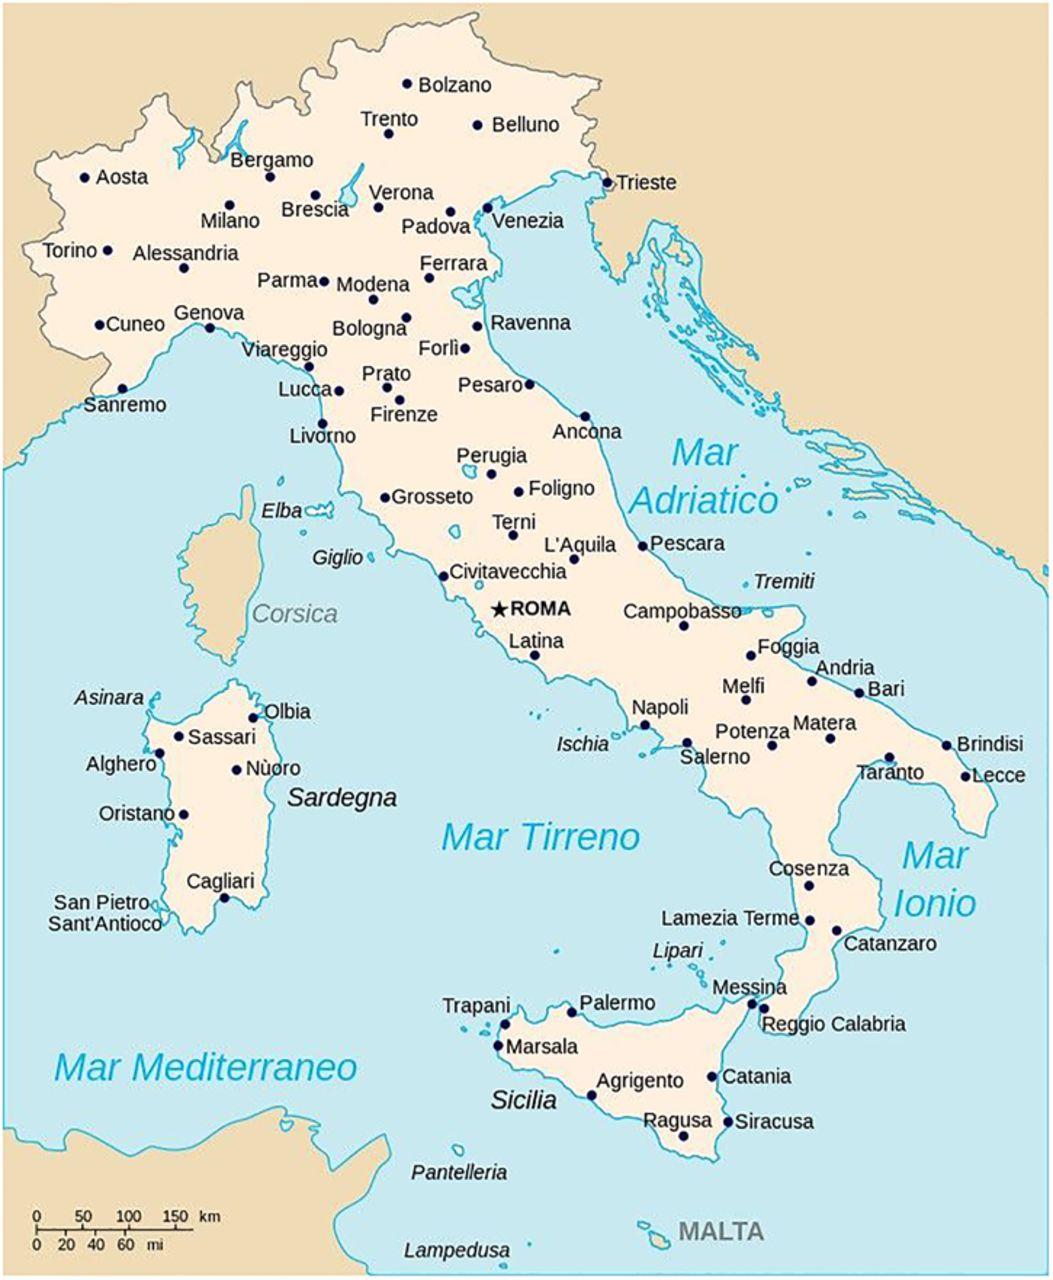 Neurological letter from Italy Practical Neurology